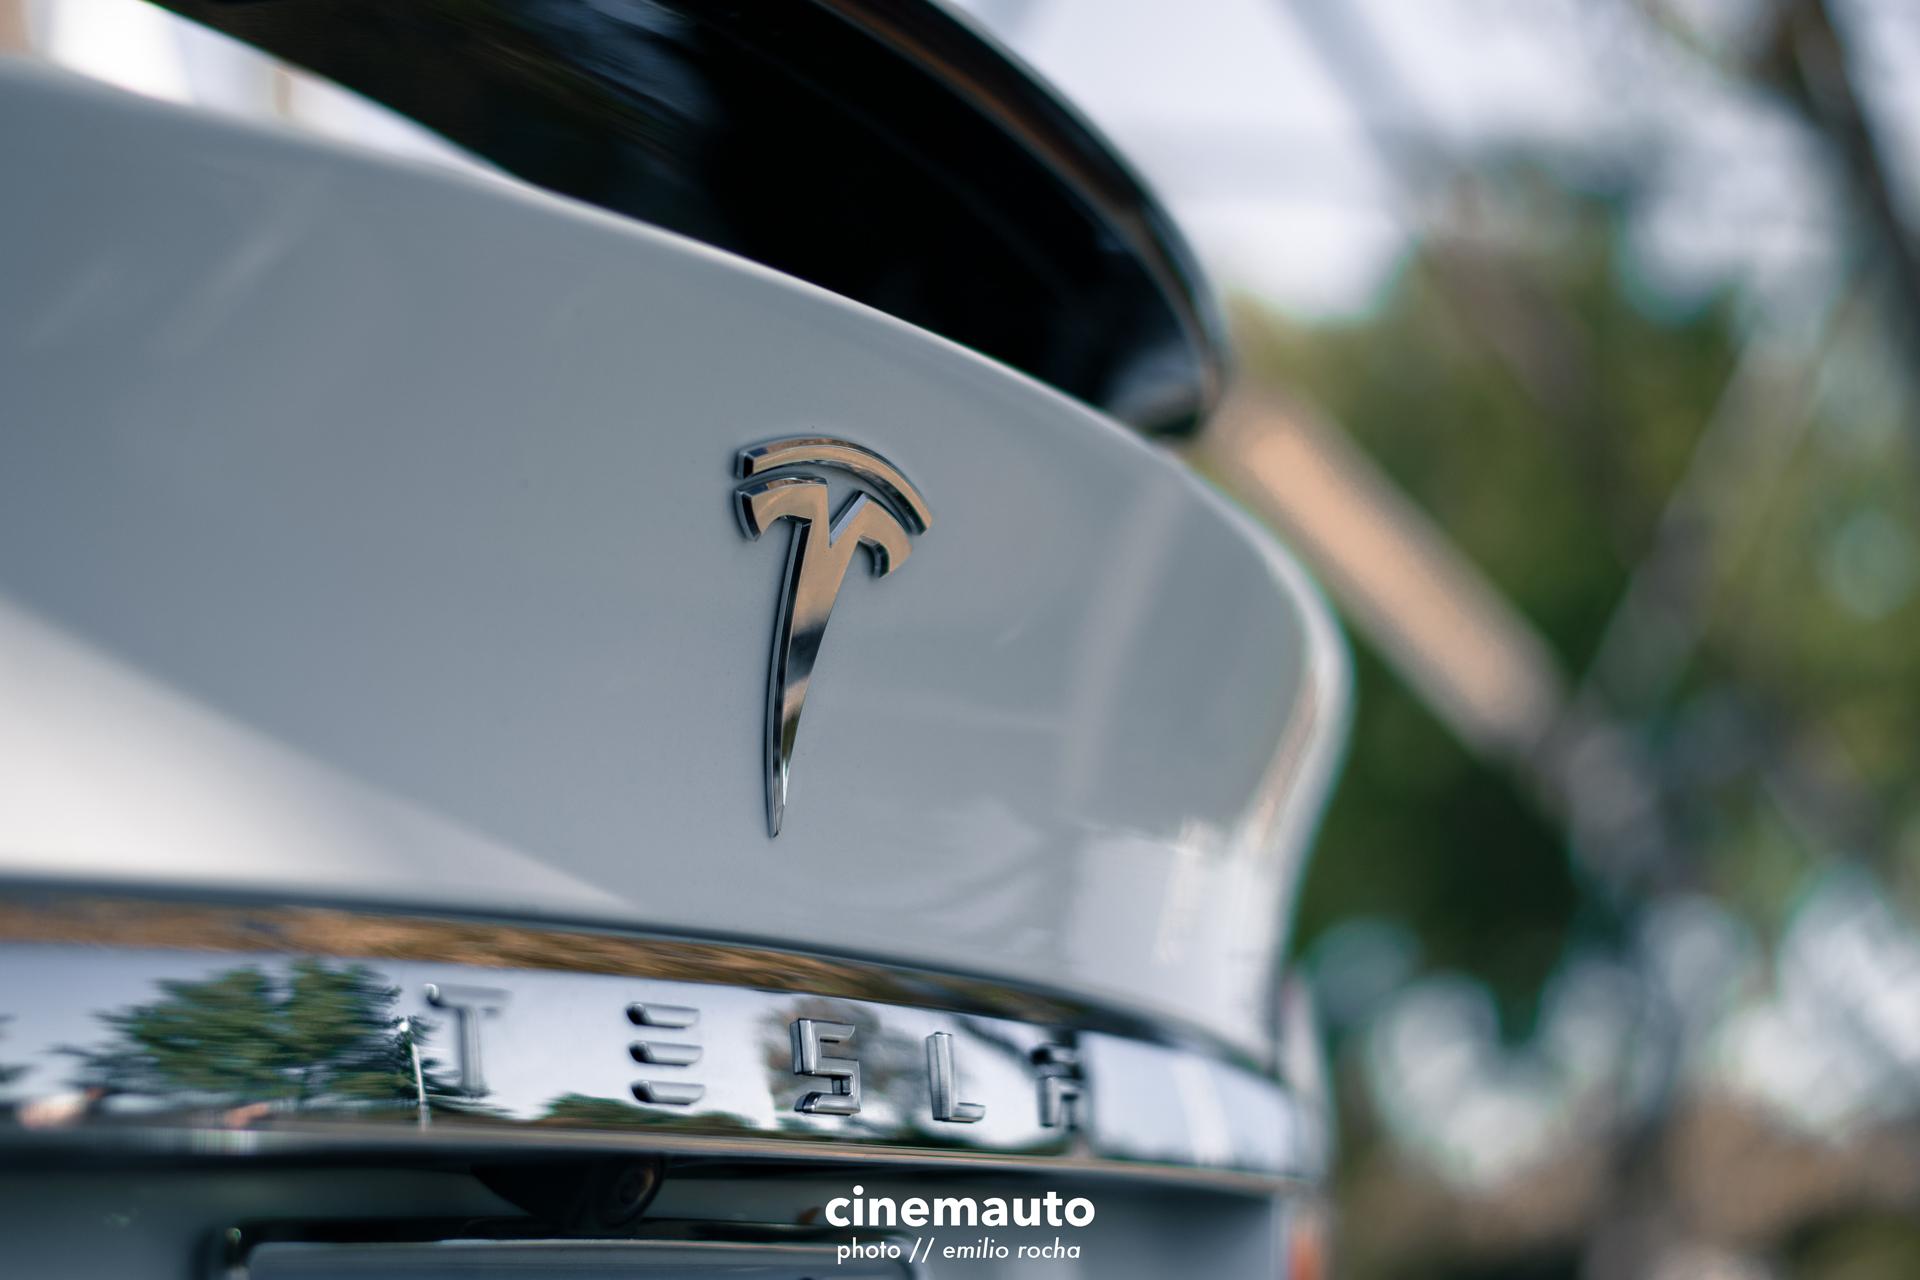 TeslaCinemauto-16.jpg